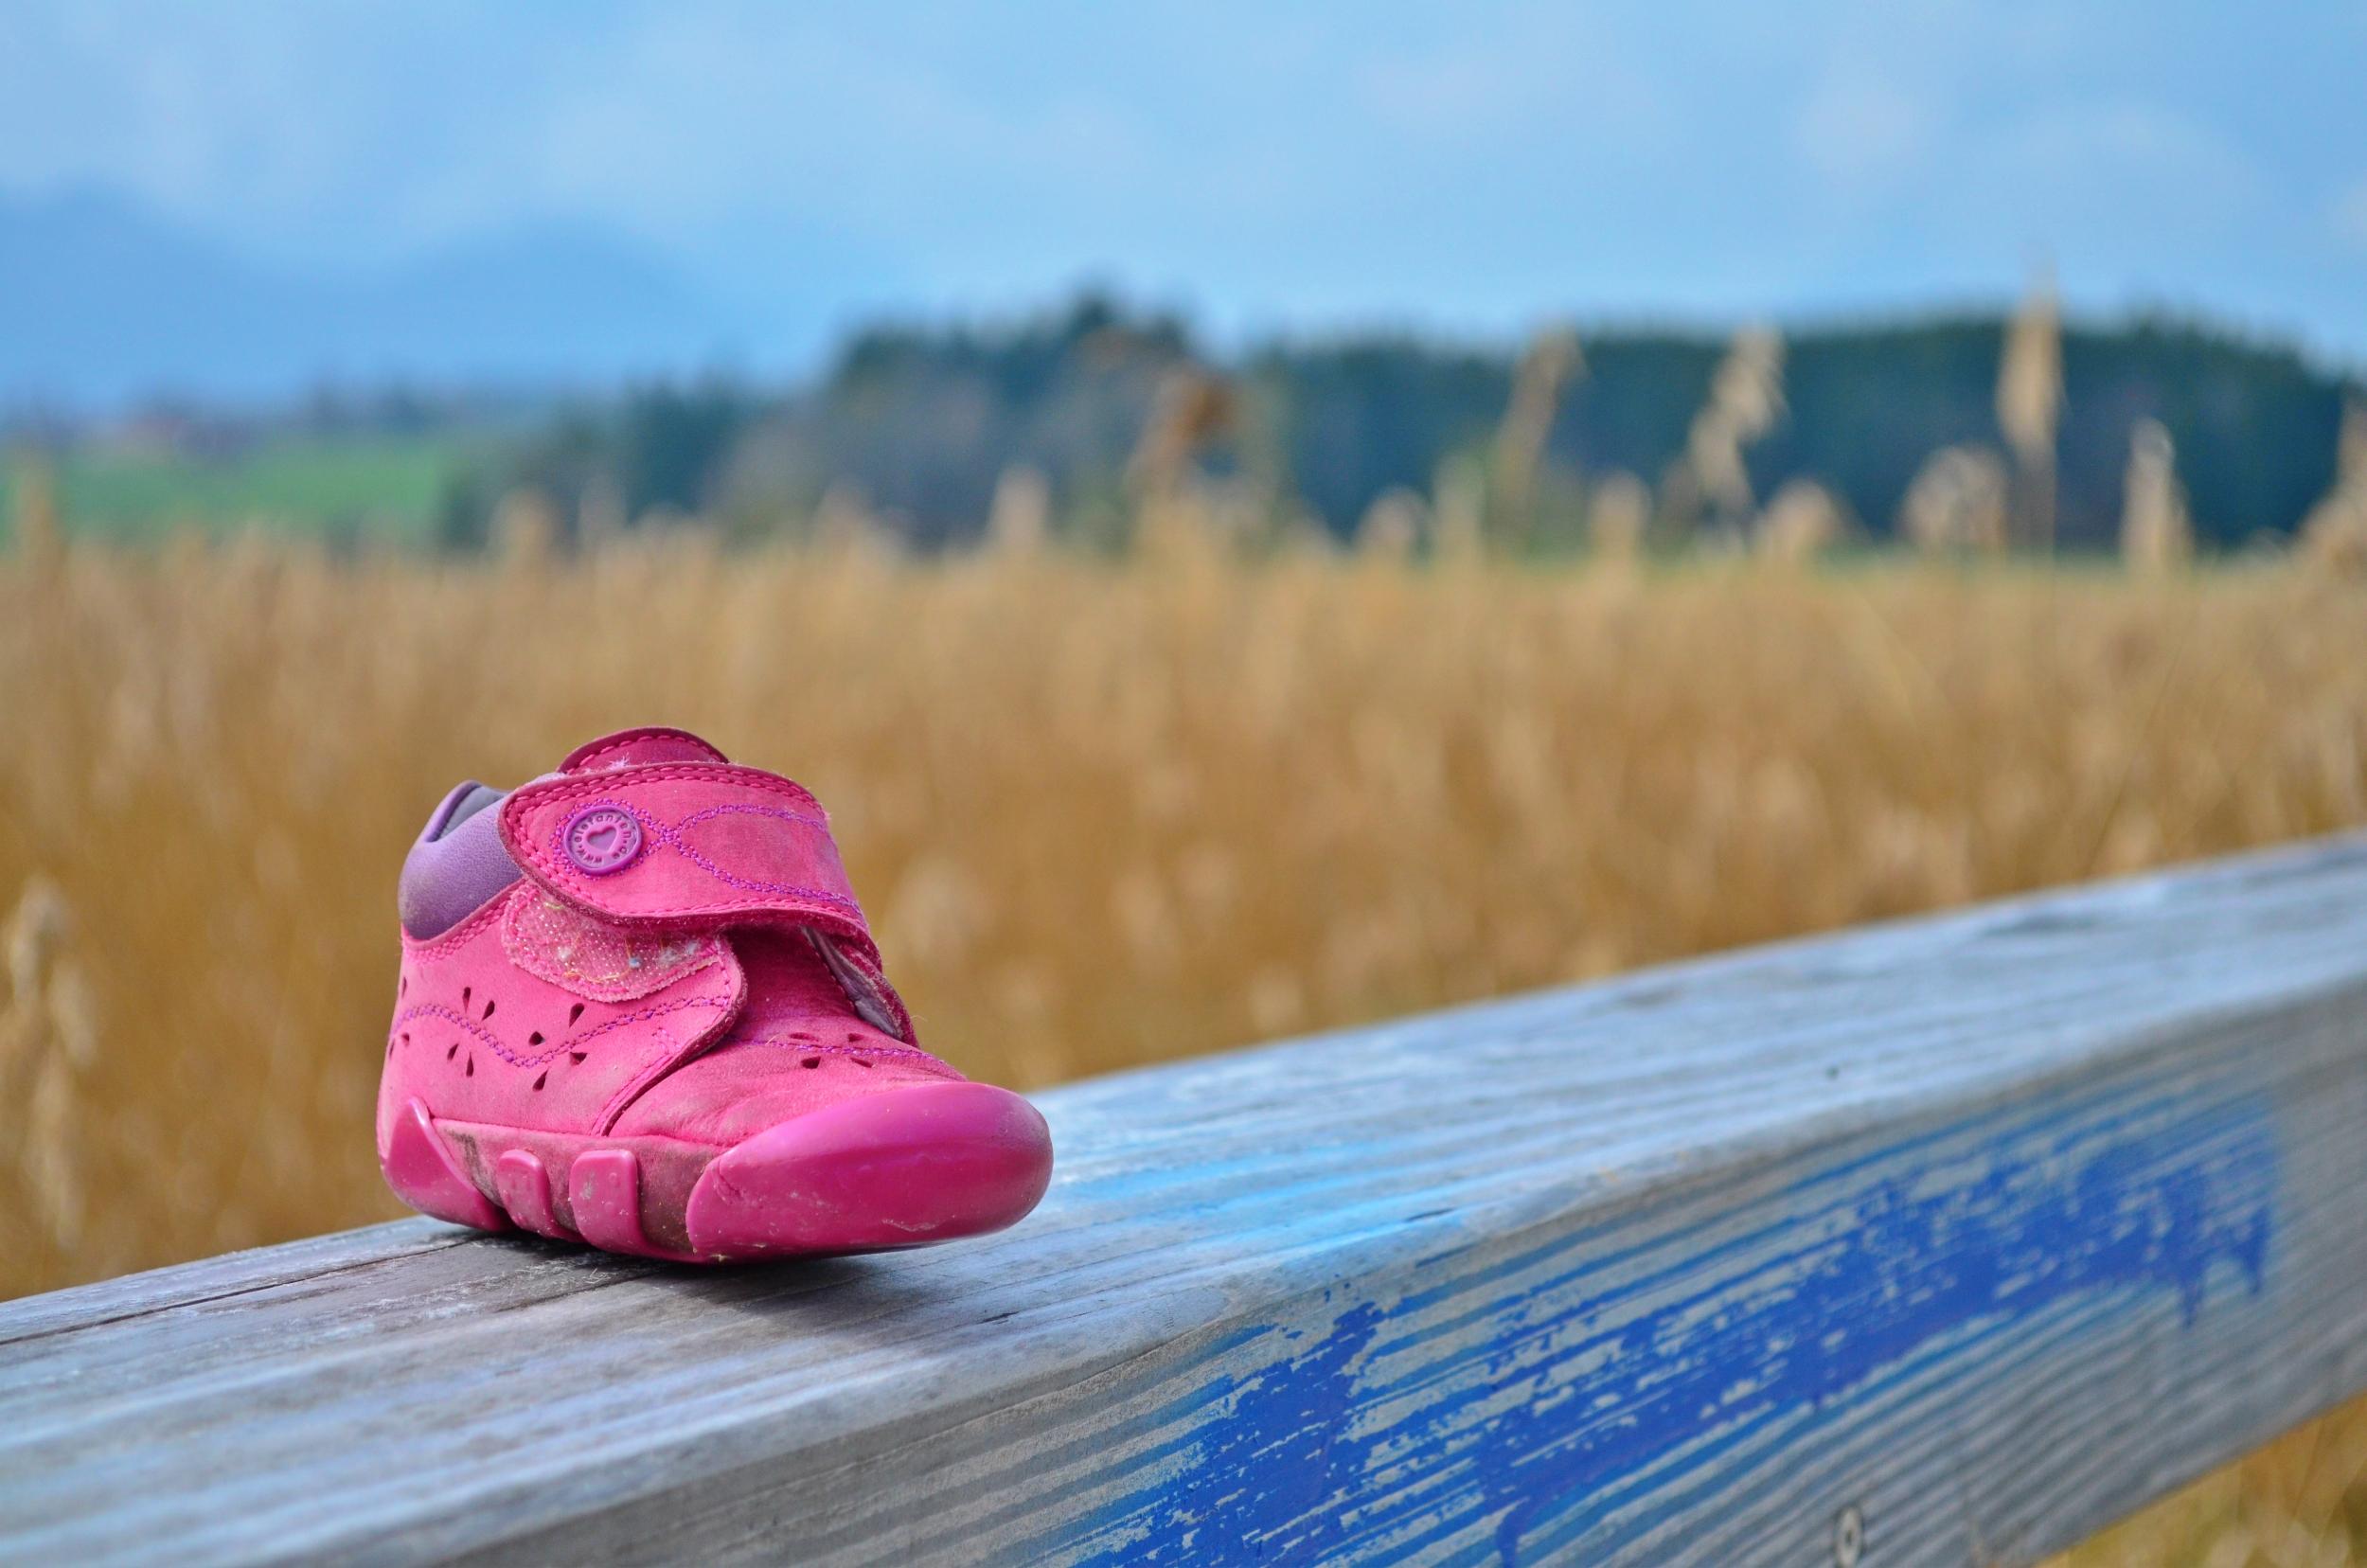 O0001 Prinzessin ohne Schuh